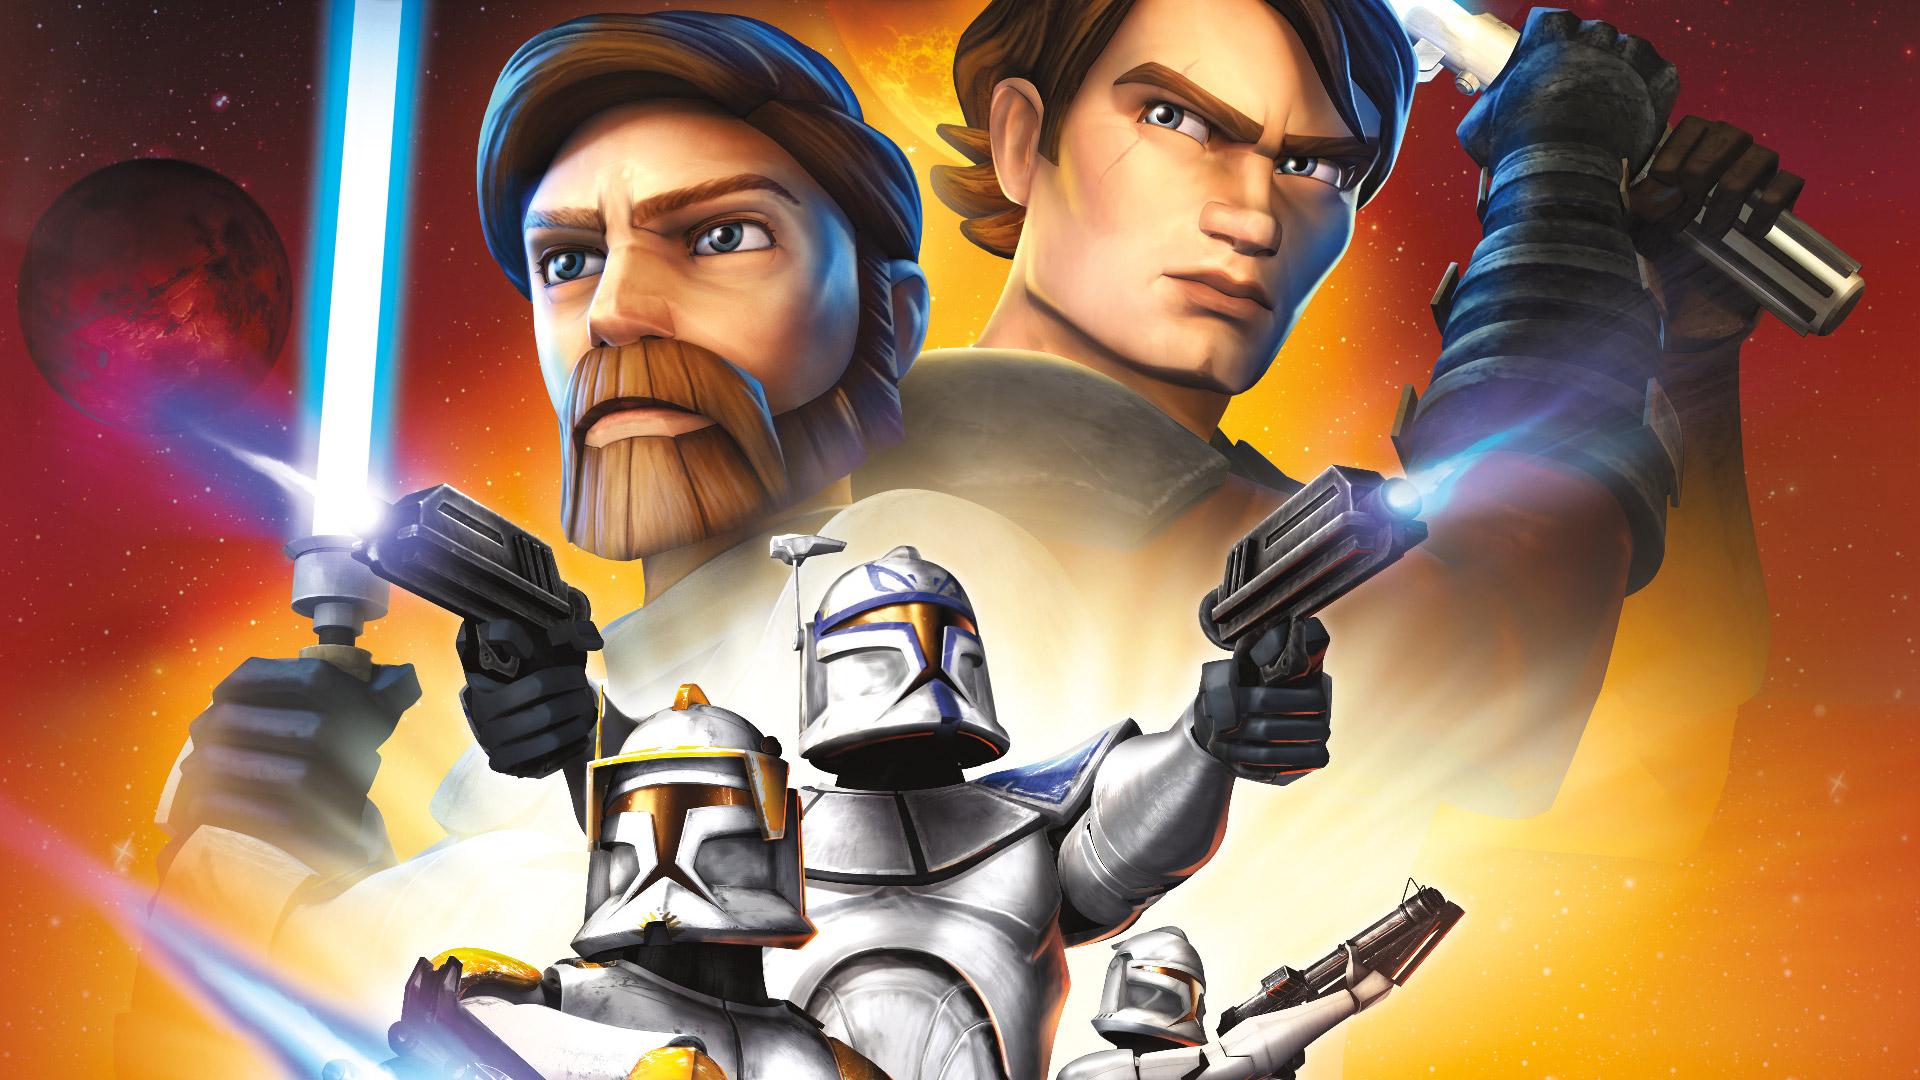 Star Wars: The Clone Wars � Republic Heroes Wallpaper in 1920x1080